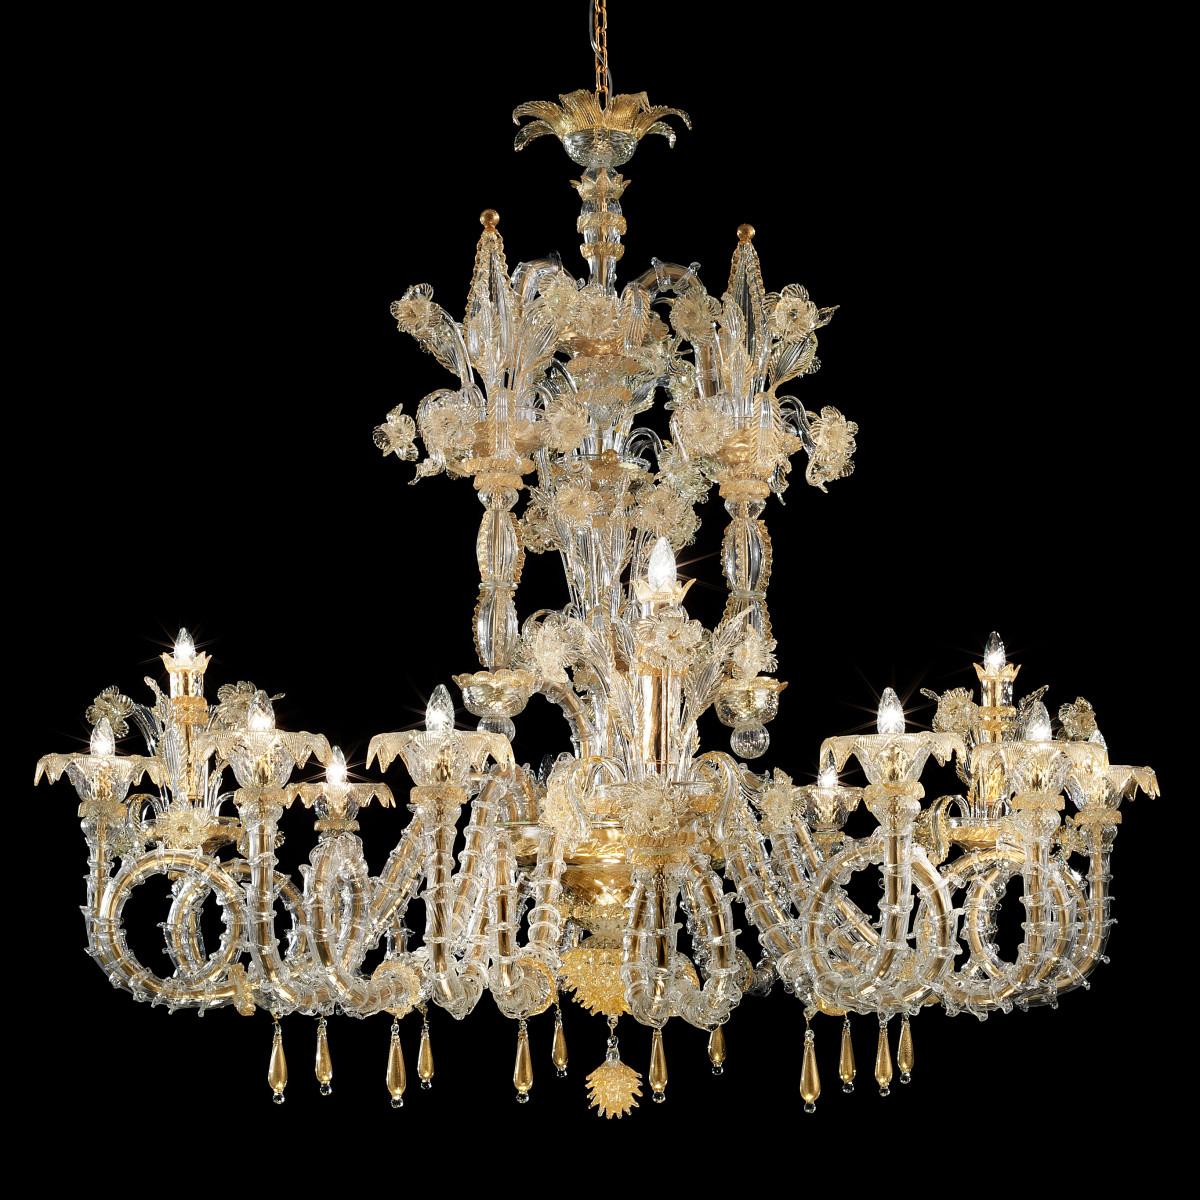 """San Zaccaria"" lustre en verre de Murano - 12 lumieres - transparent or"